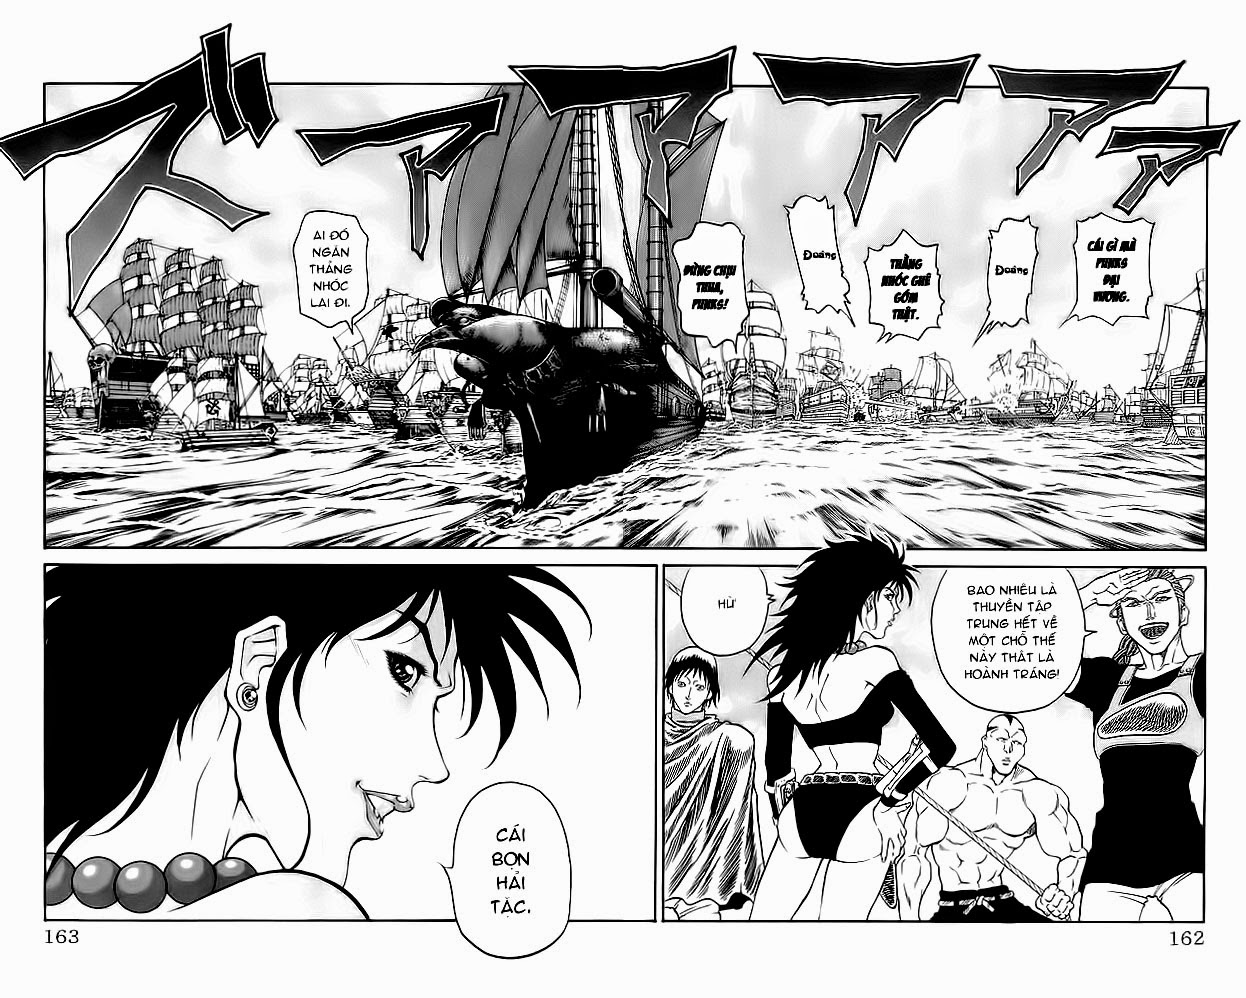 Vua Trên Biển – Coco Full Ahead chap 221 Trang 16 - Mangak.info